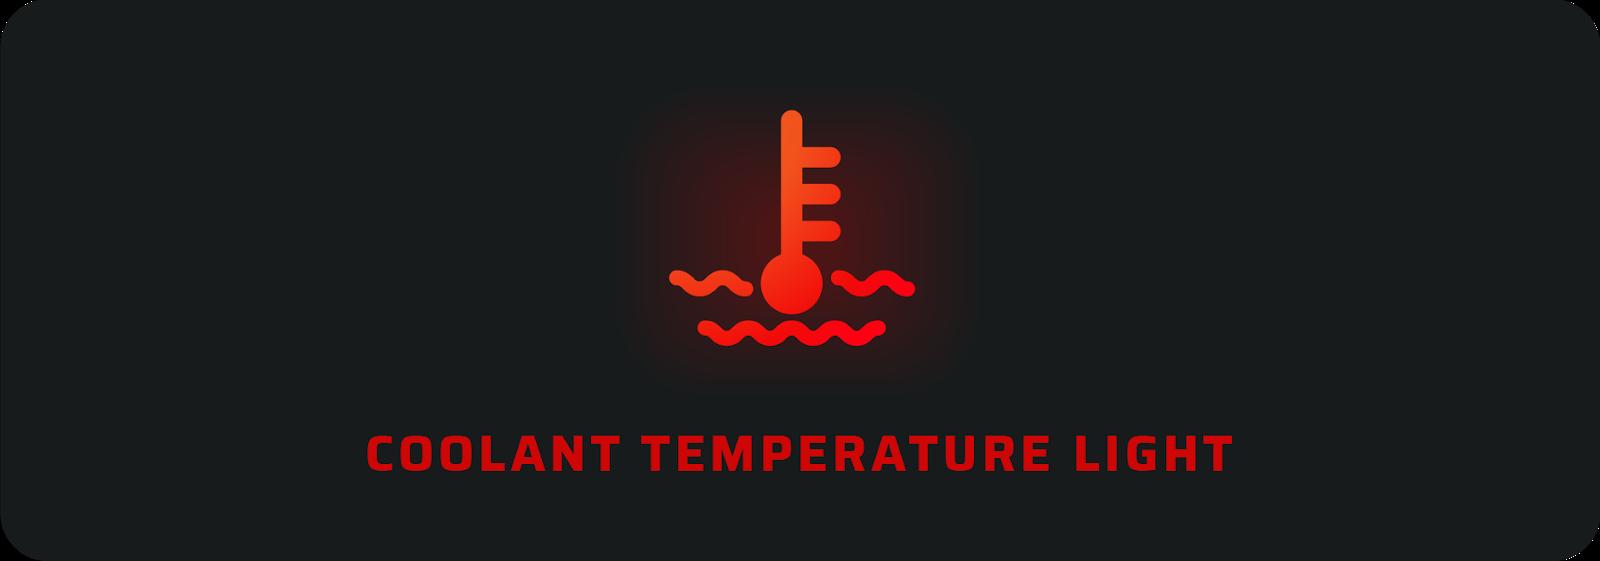 Car warning lights: Coolant temperature